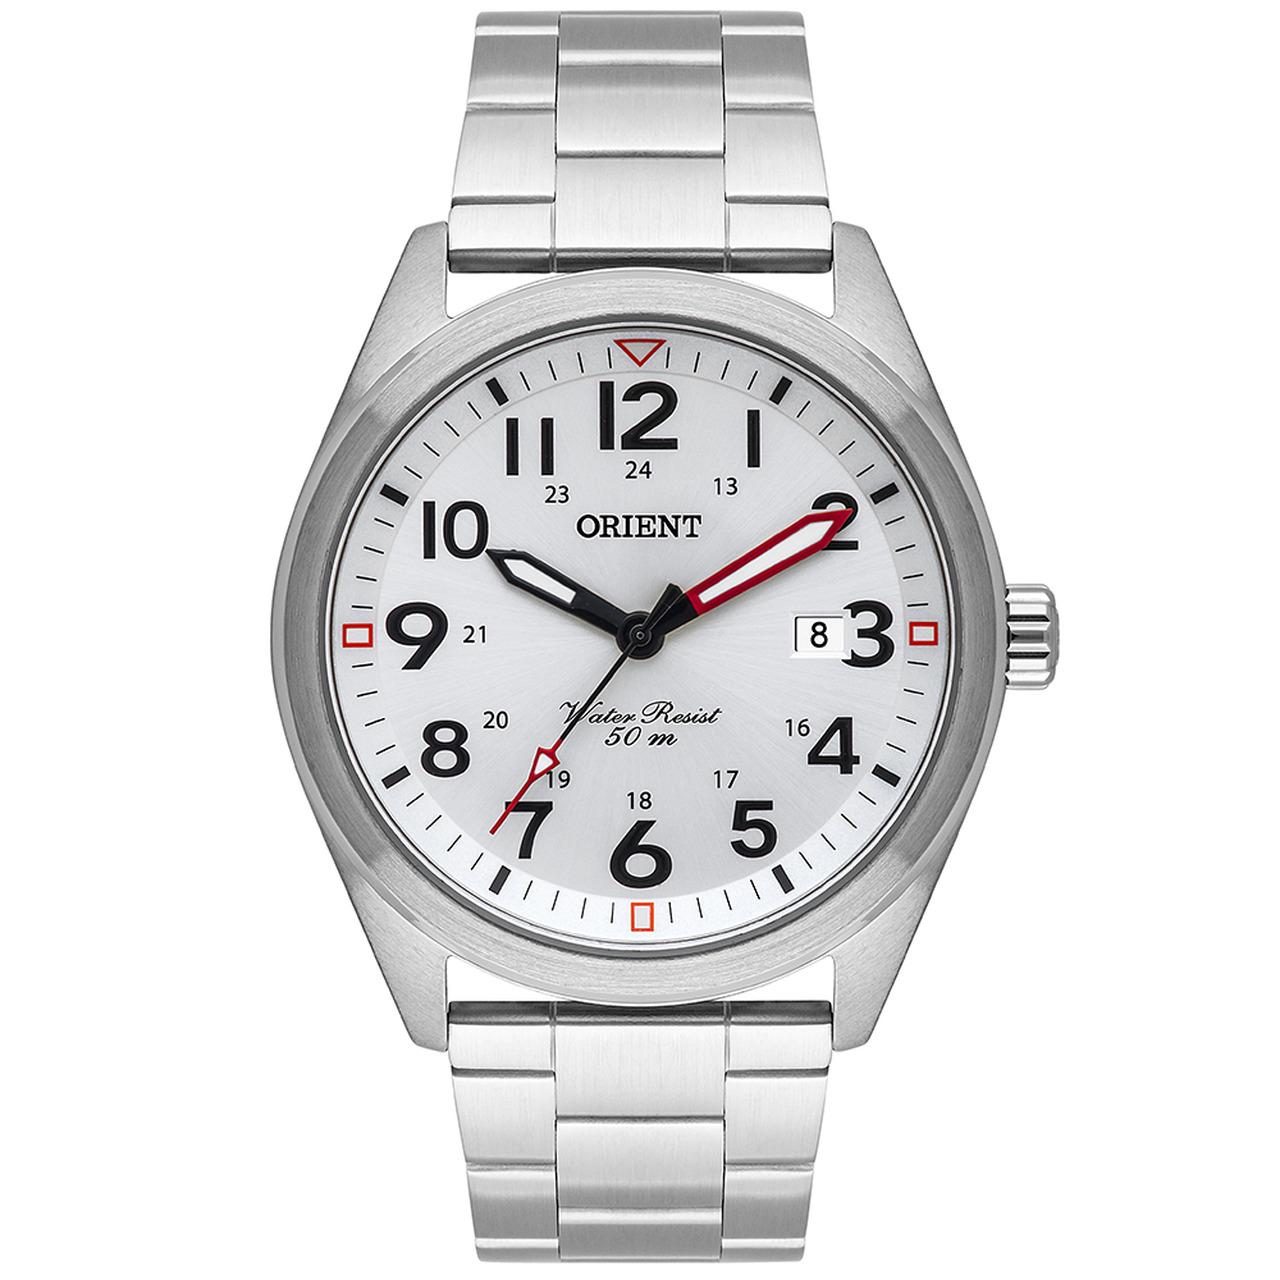 Relógio Orient Sport Masculino Analógico MBSS1396 Prata